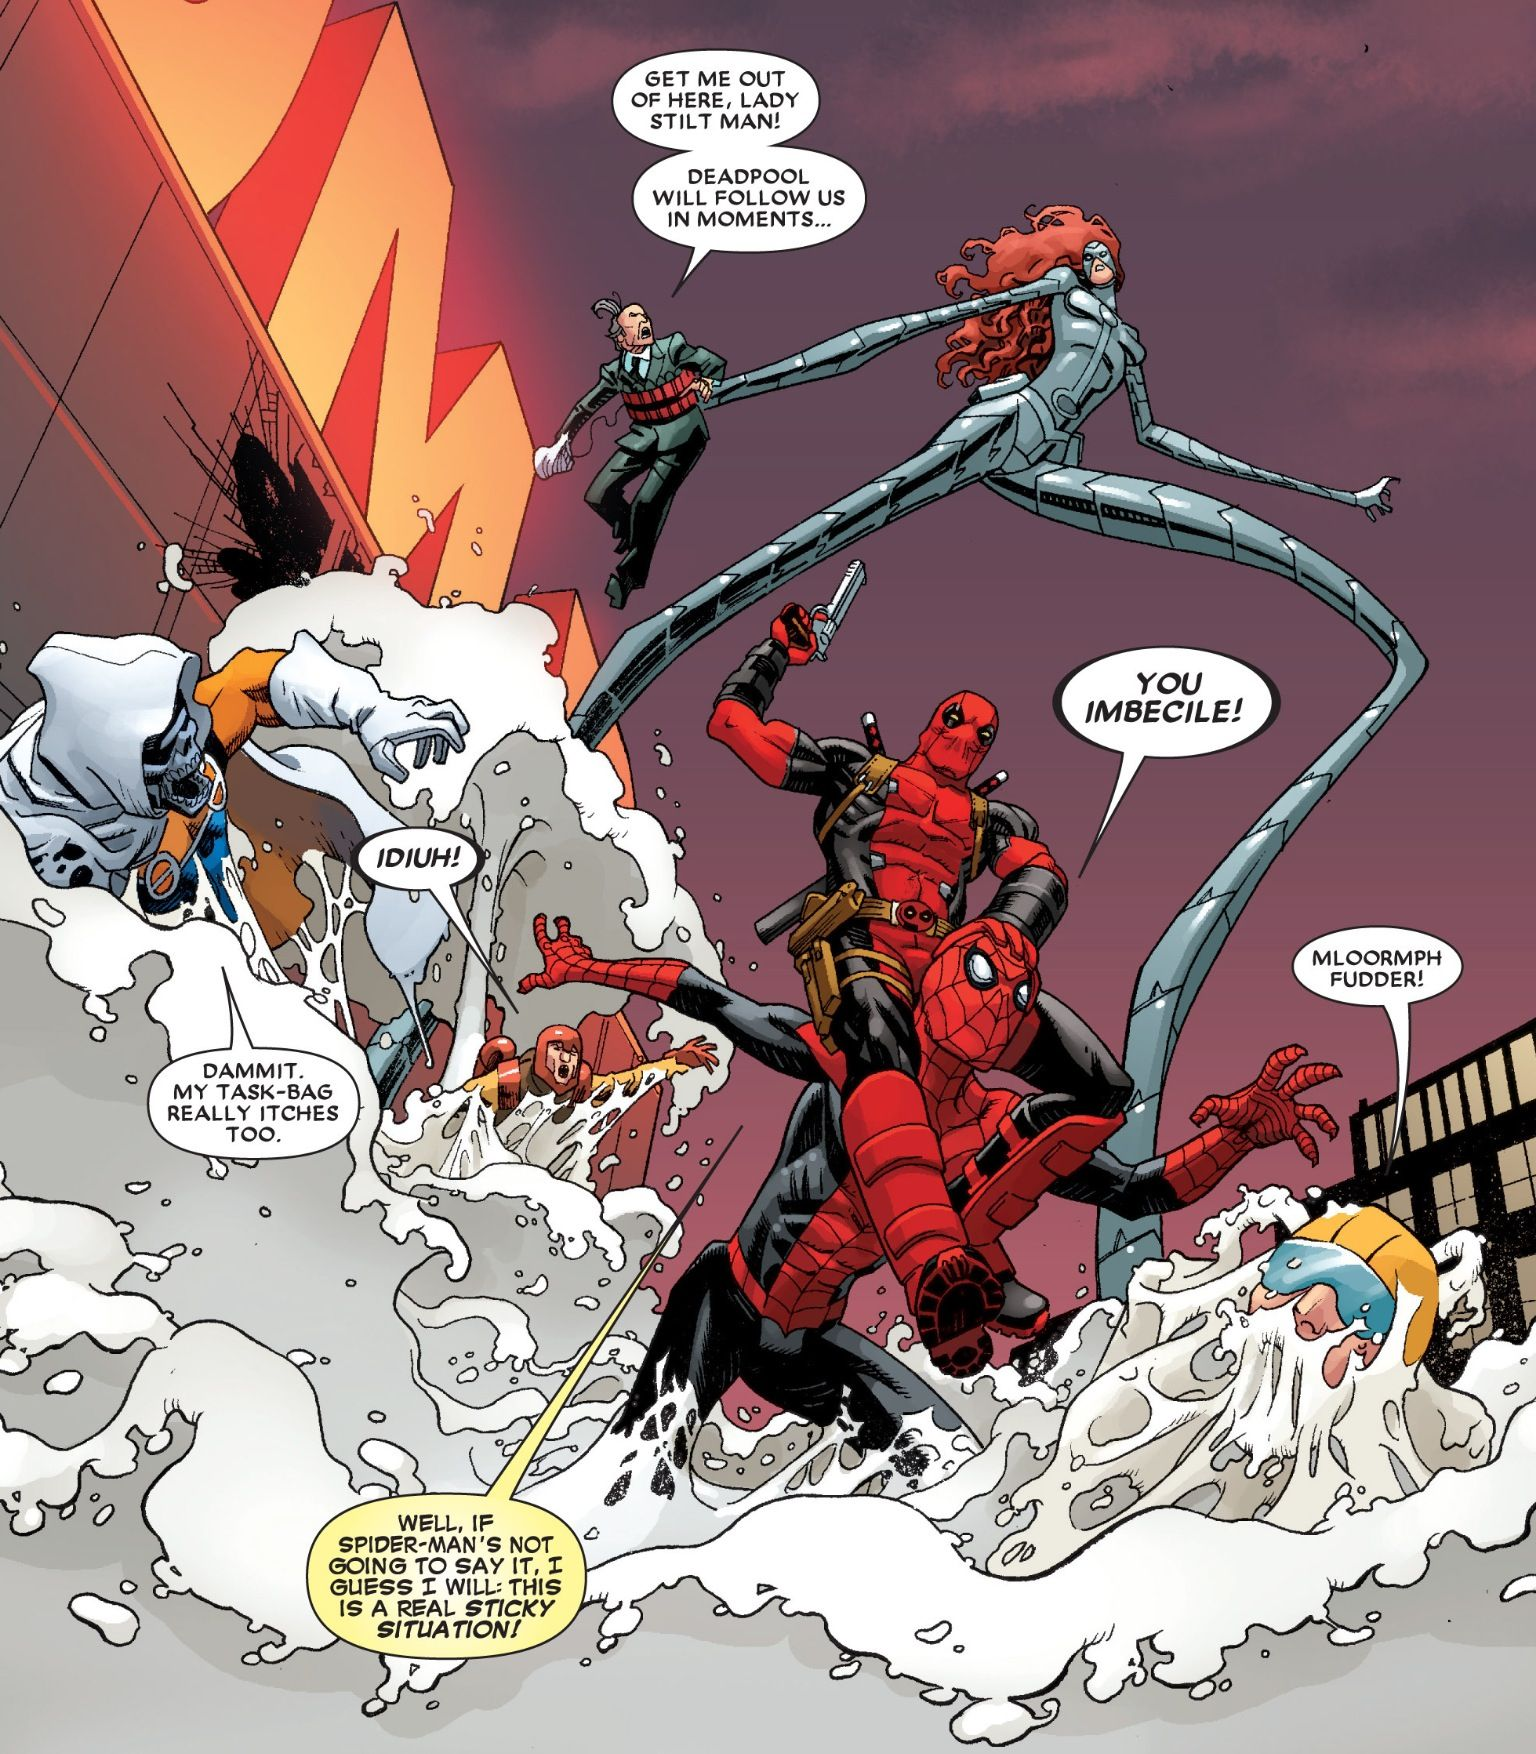 Deadpool, Vol. 4, #10. (2013).  Artist: Mike Hawthorne; Colorist: Val Staples;